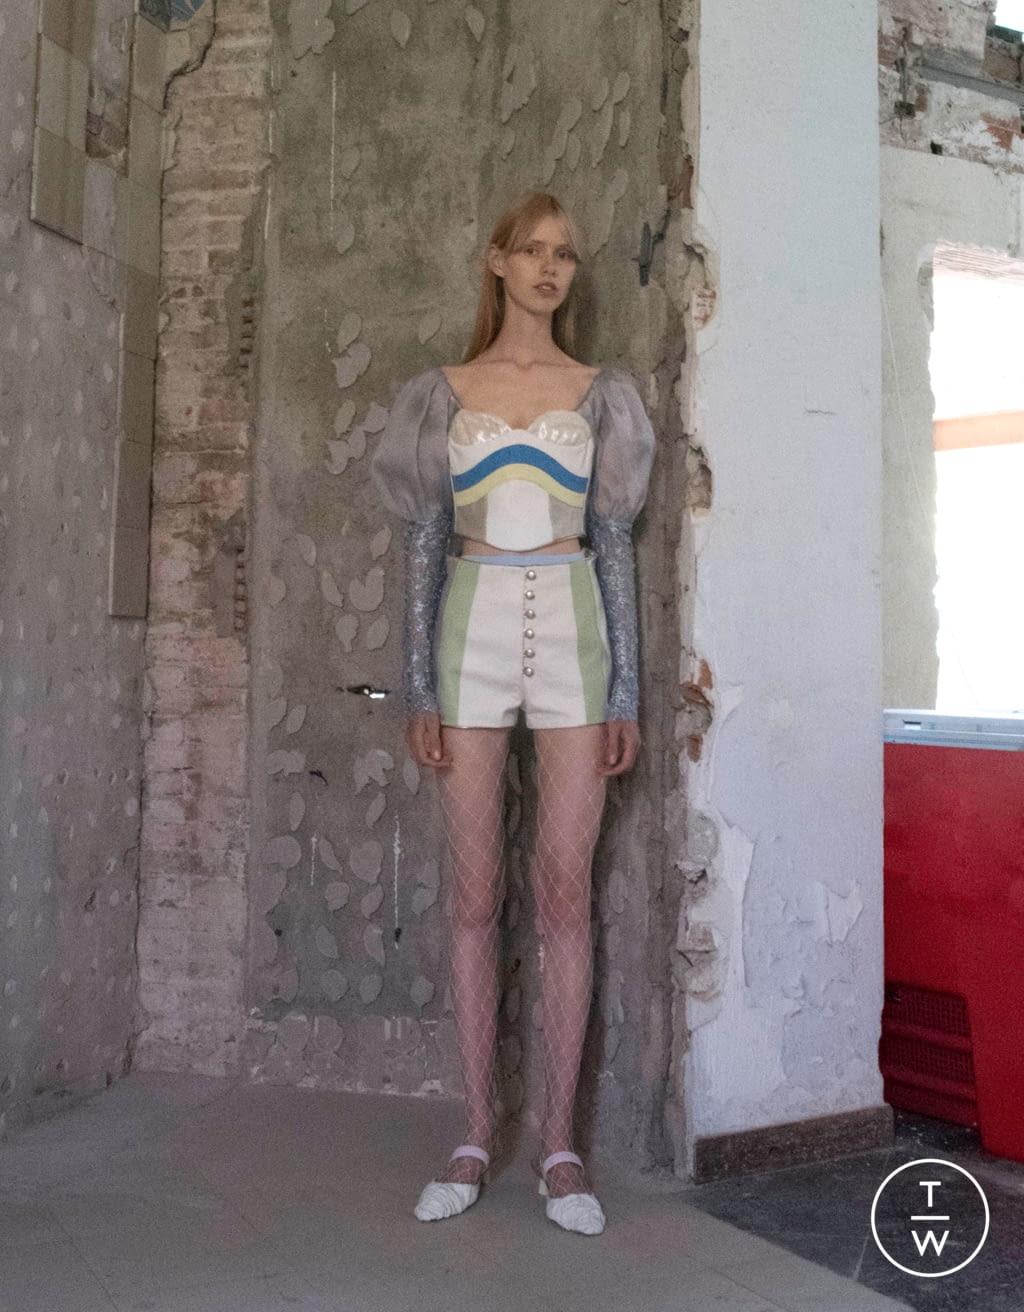 Tappezzeria Trompe L Oeil mietis s/s 18 womenswear #7 - the fashion search engine